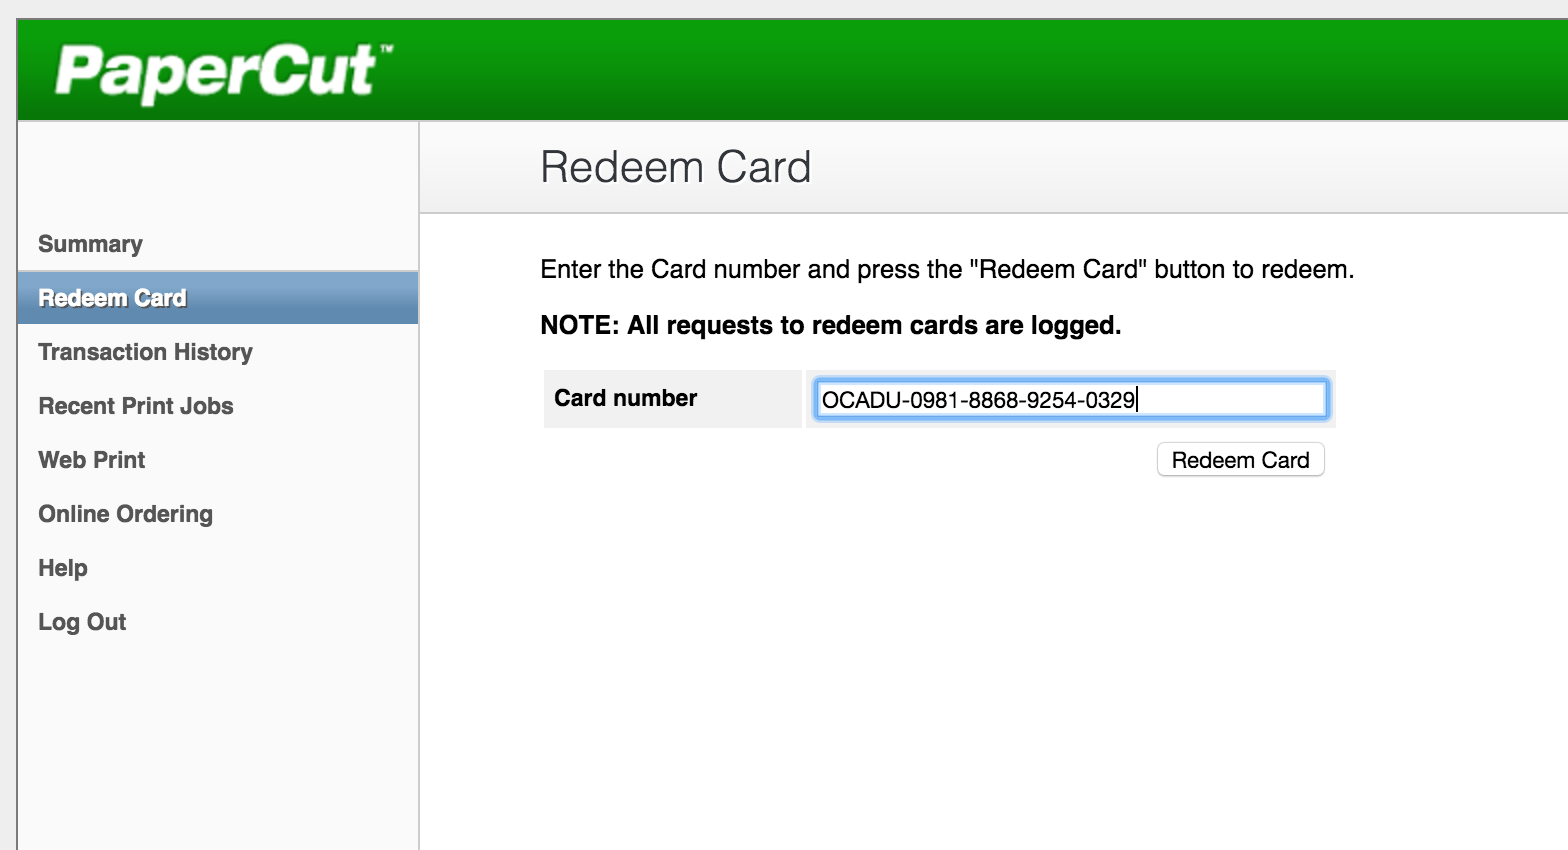 Redeem Card Step 1